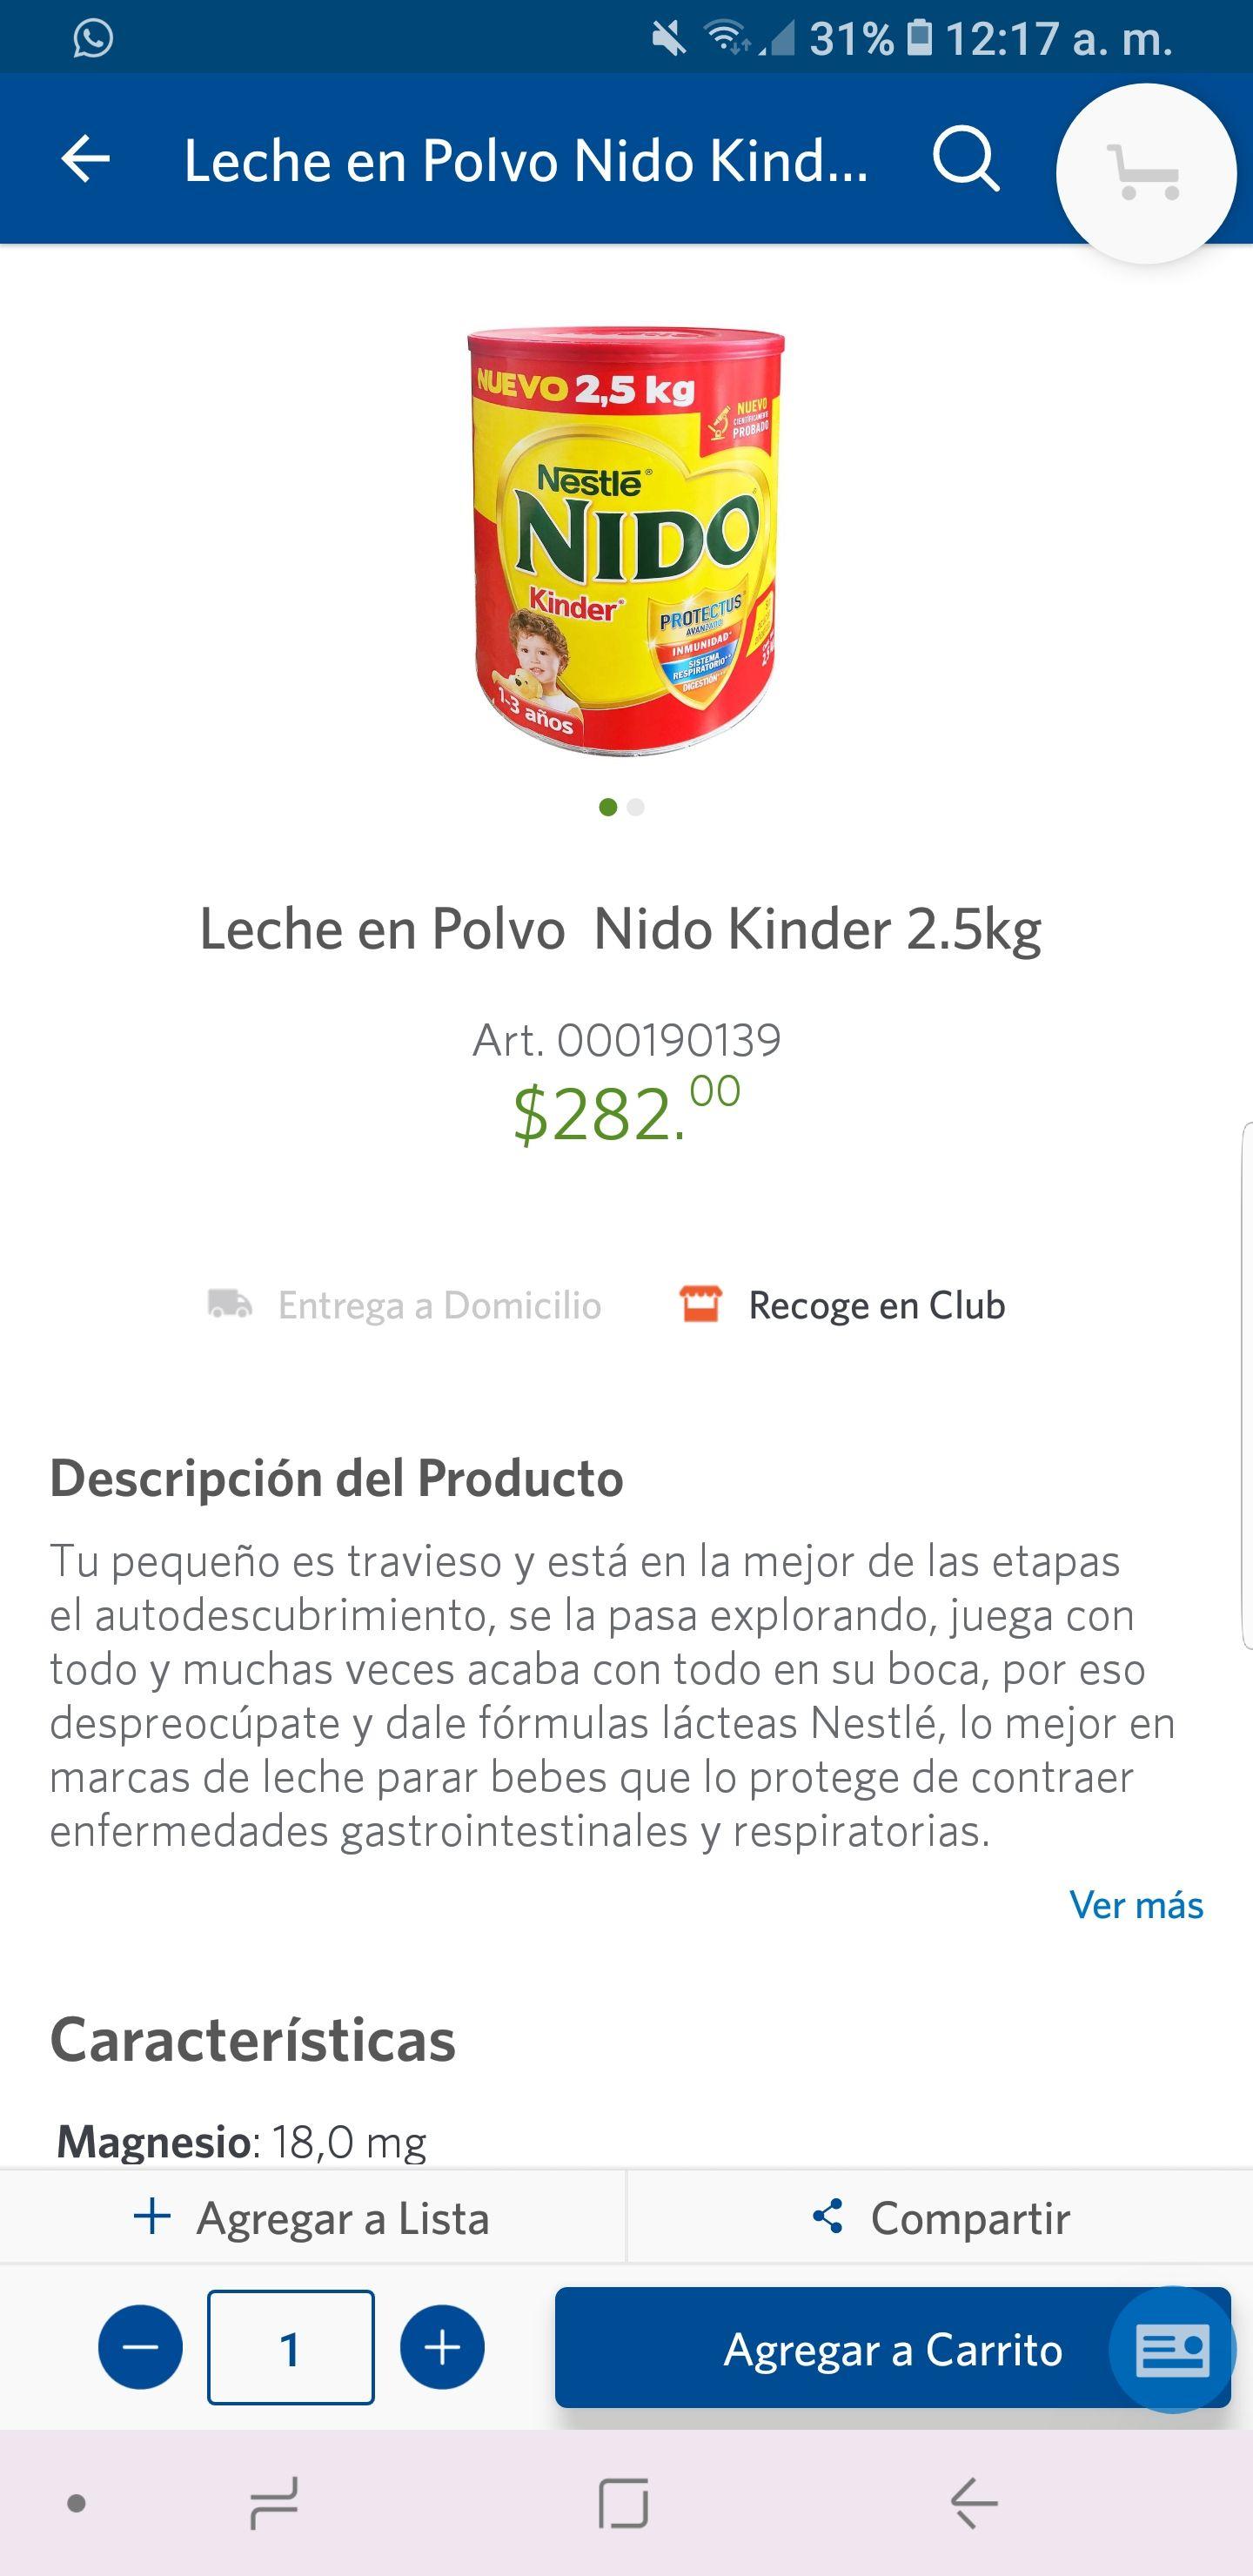 Sam's Club: Leche en Polvo Nido Kinder 2.5kg